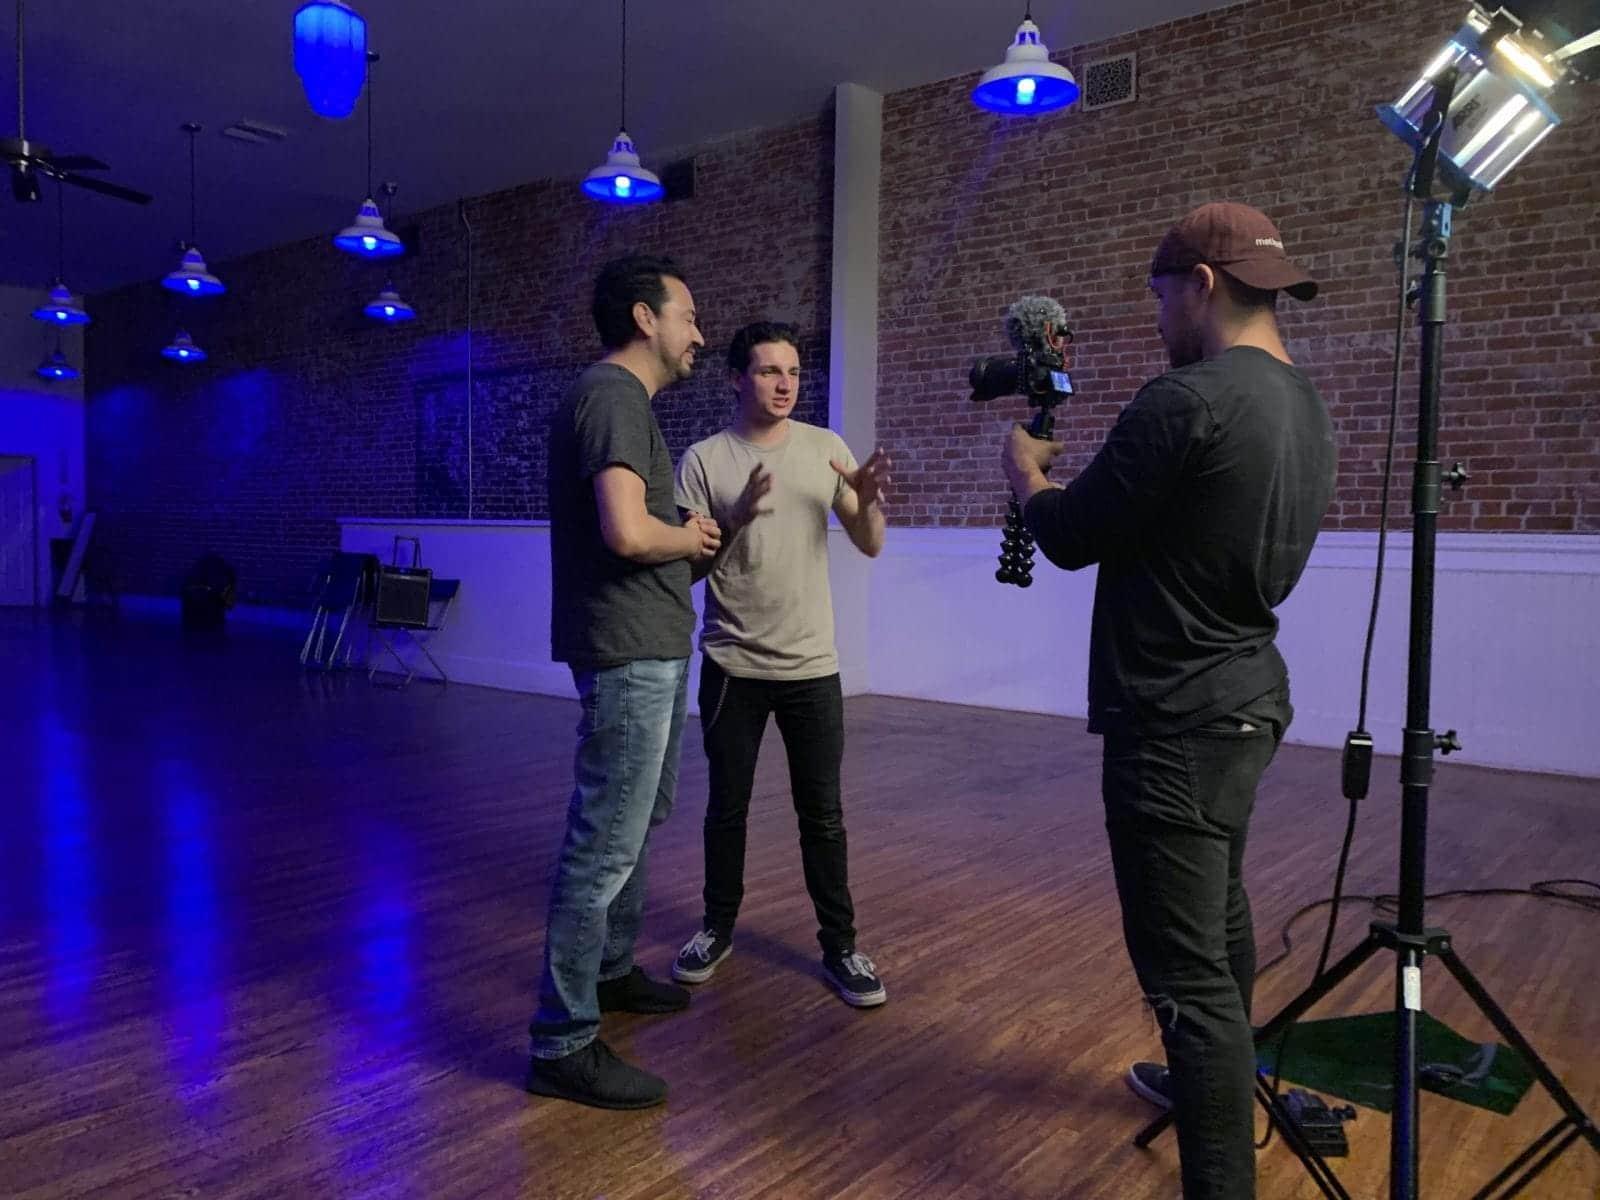 studio shoot under blue light